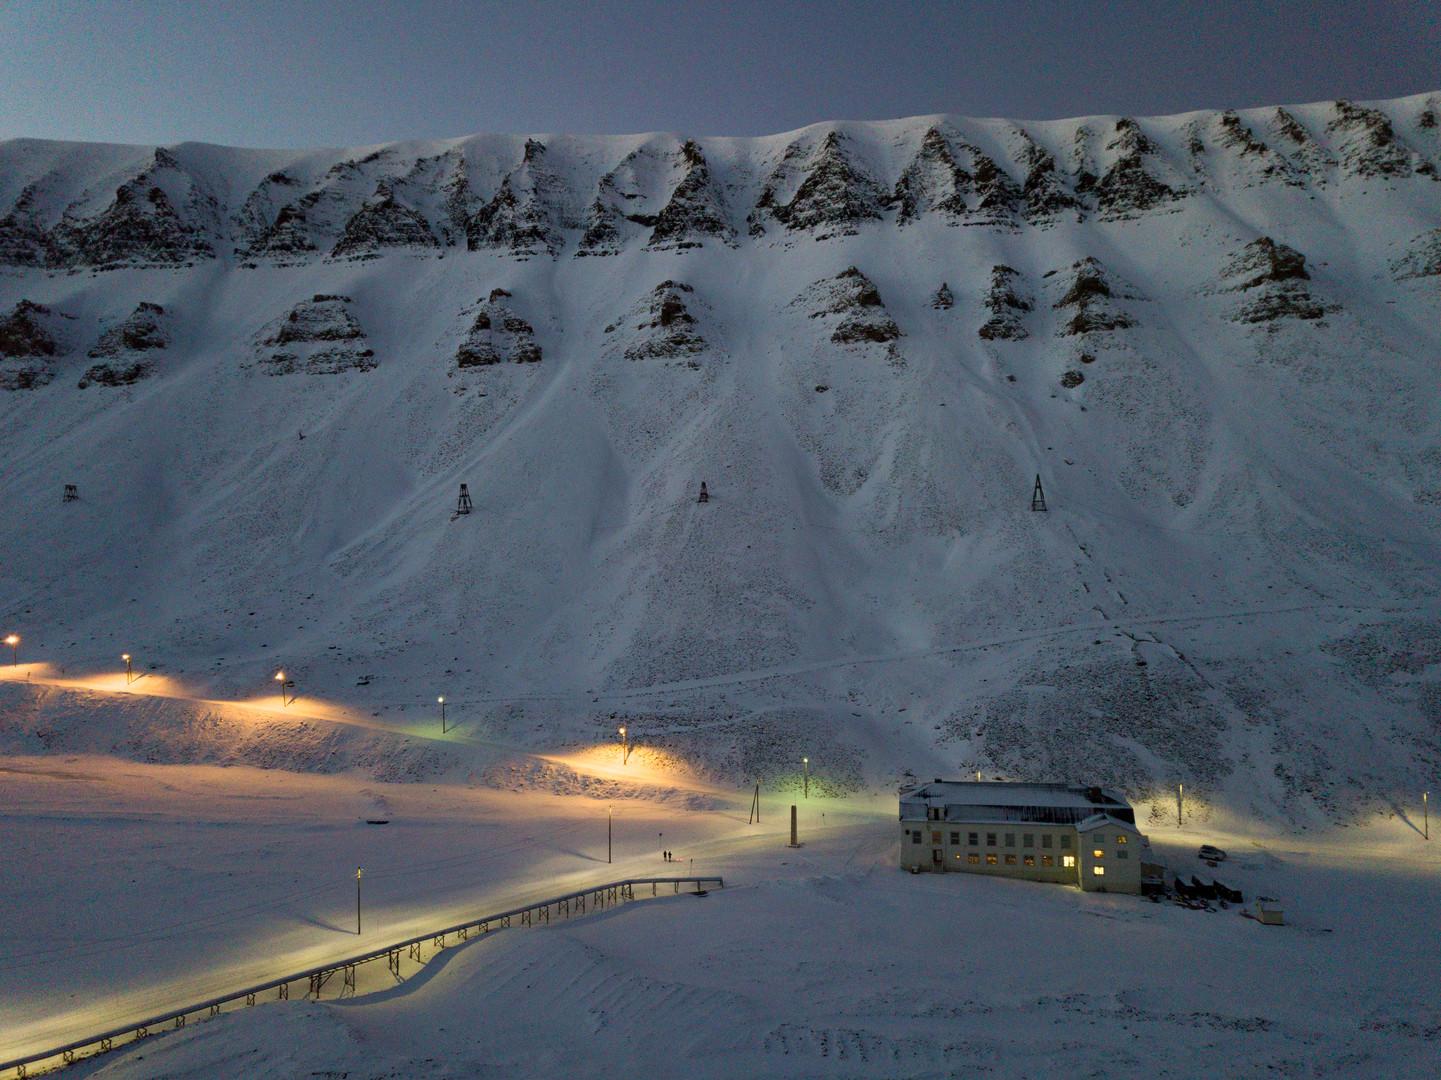 Huset Svalbard Winter by CeciliaBlomdahl